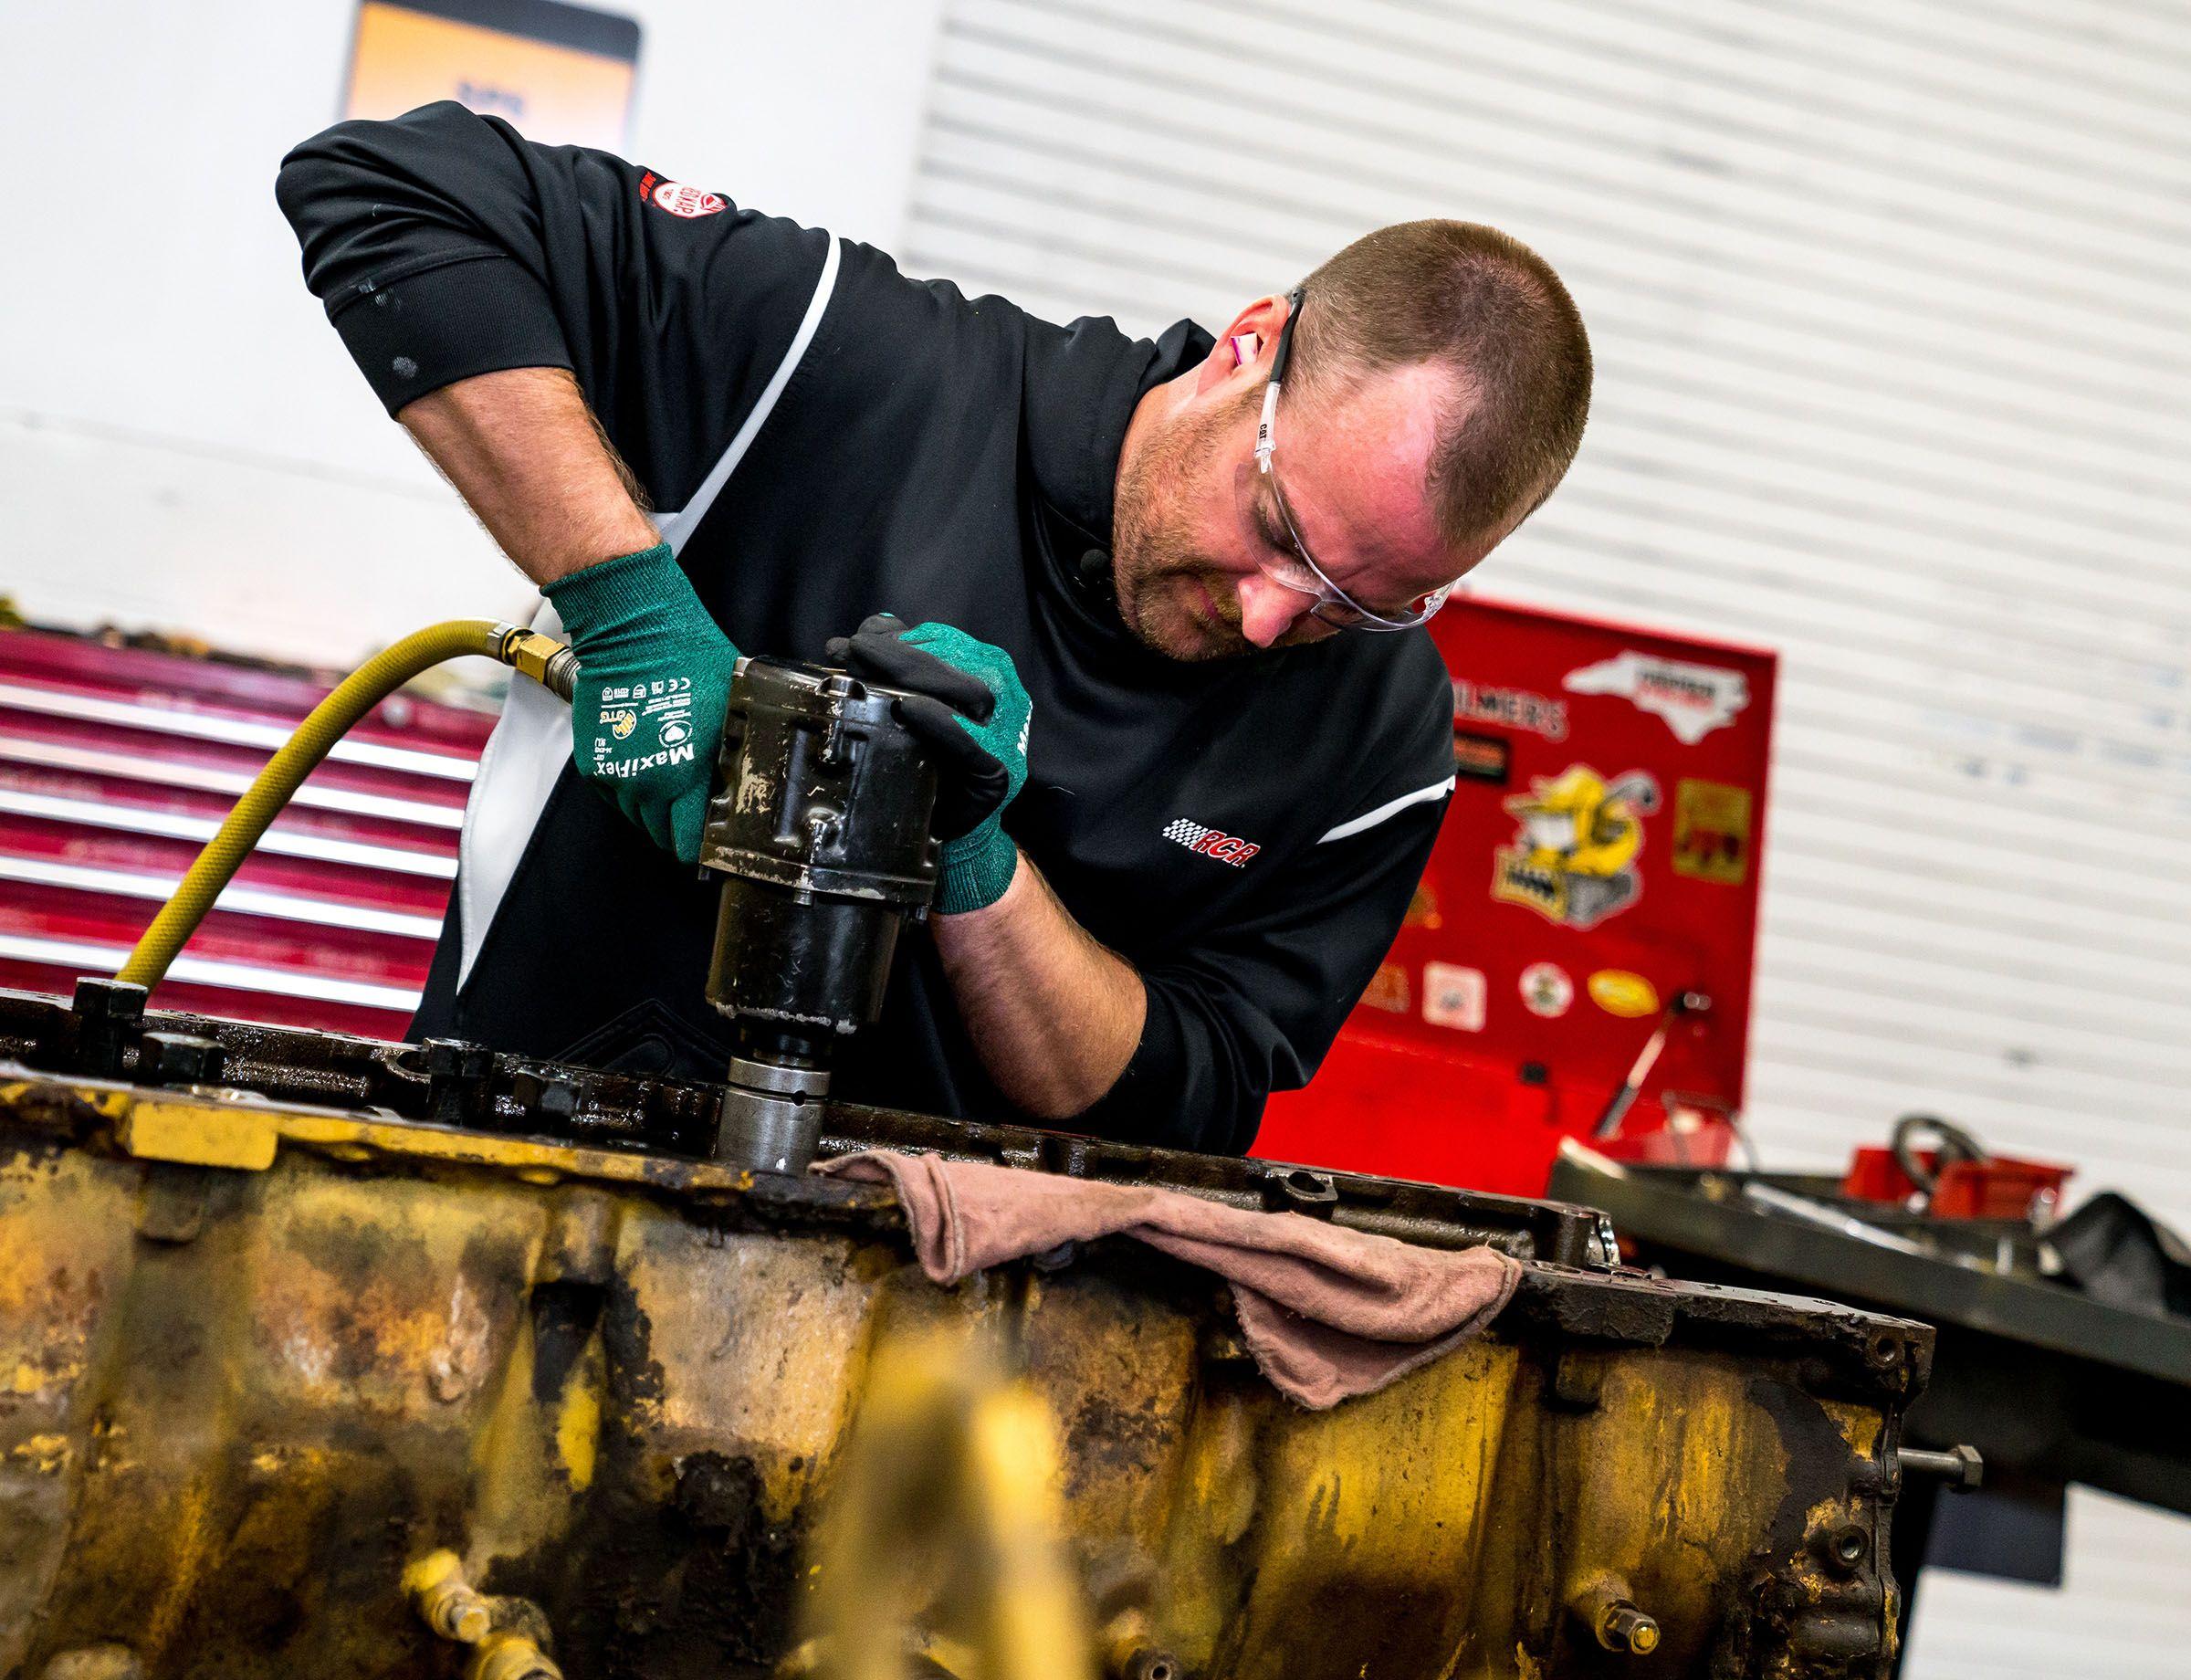 RCR technician Blake Zobrist helps remove a crankshaft from a C18 engine.